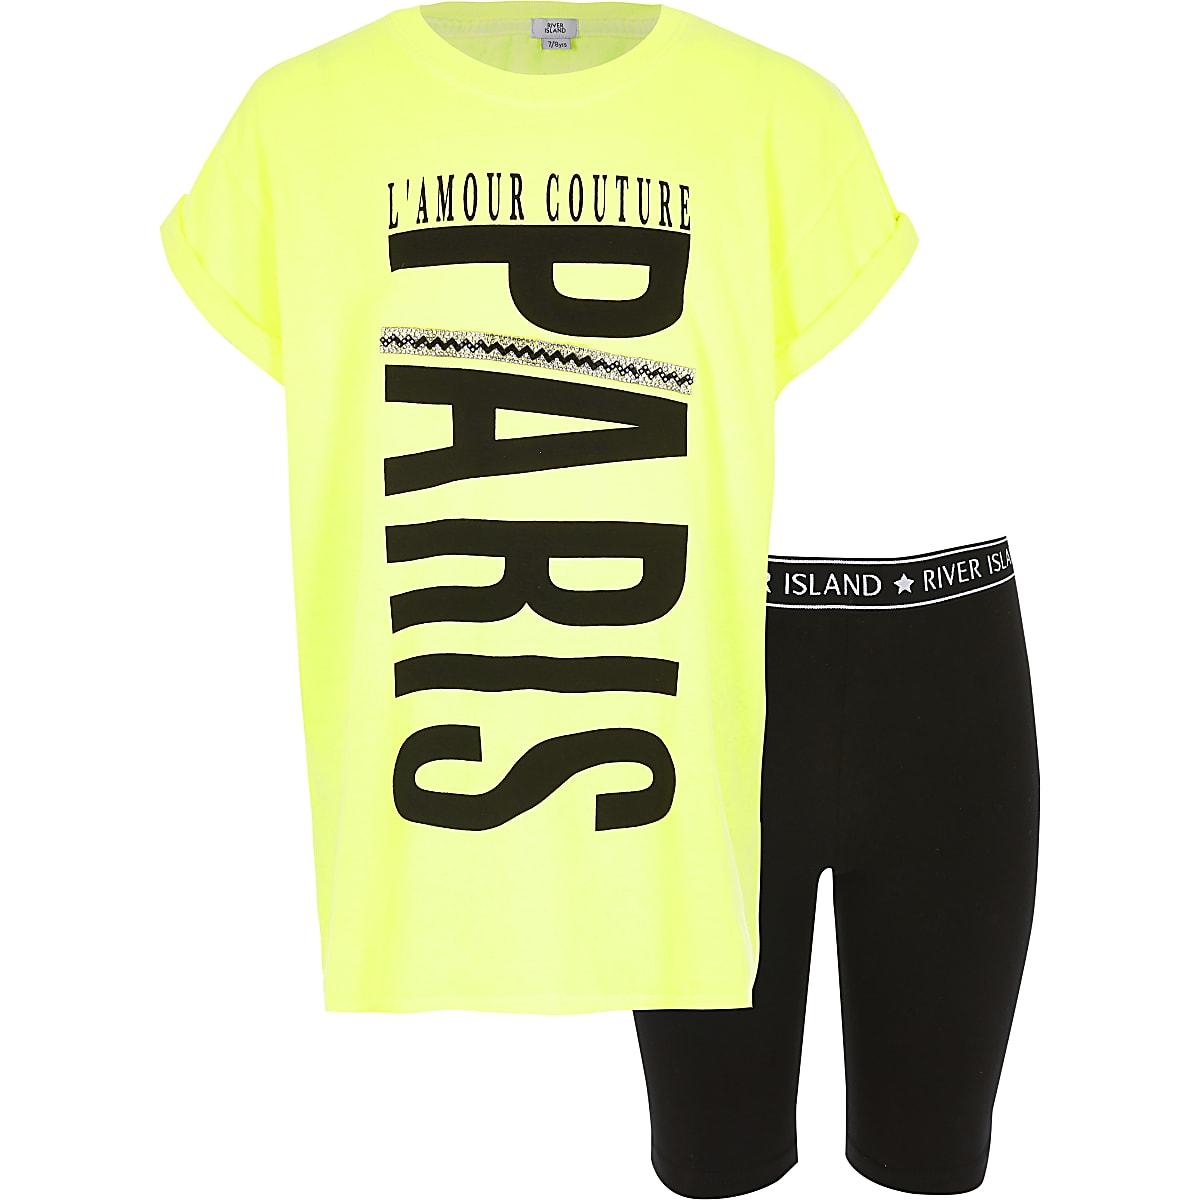 Girls neon yellow 'Paris' T-shirt outfit